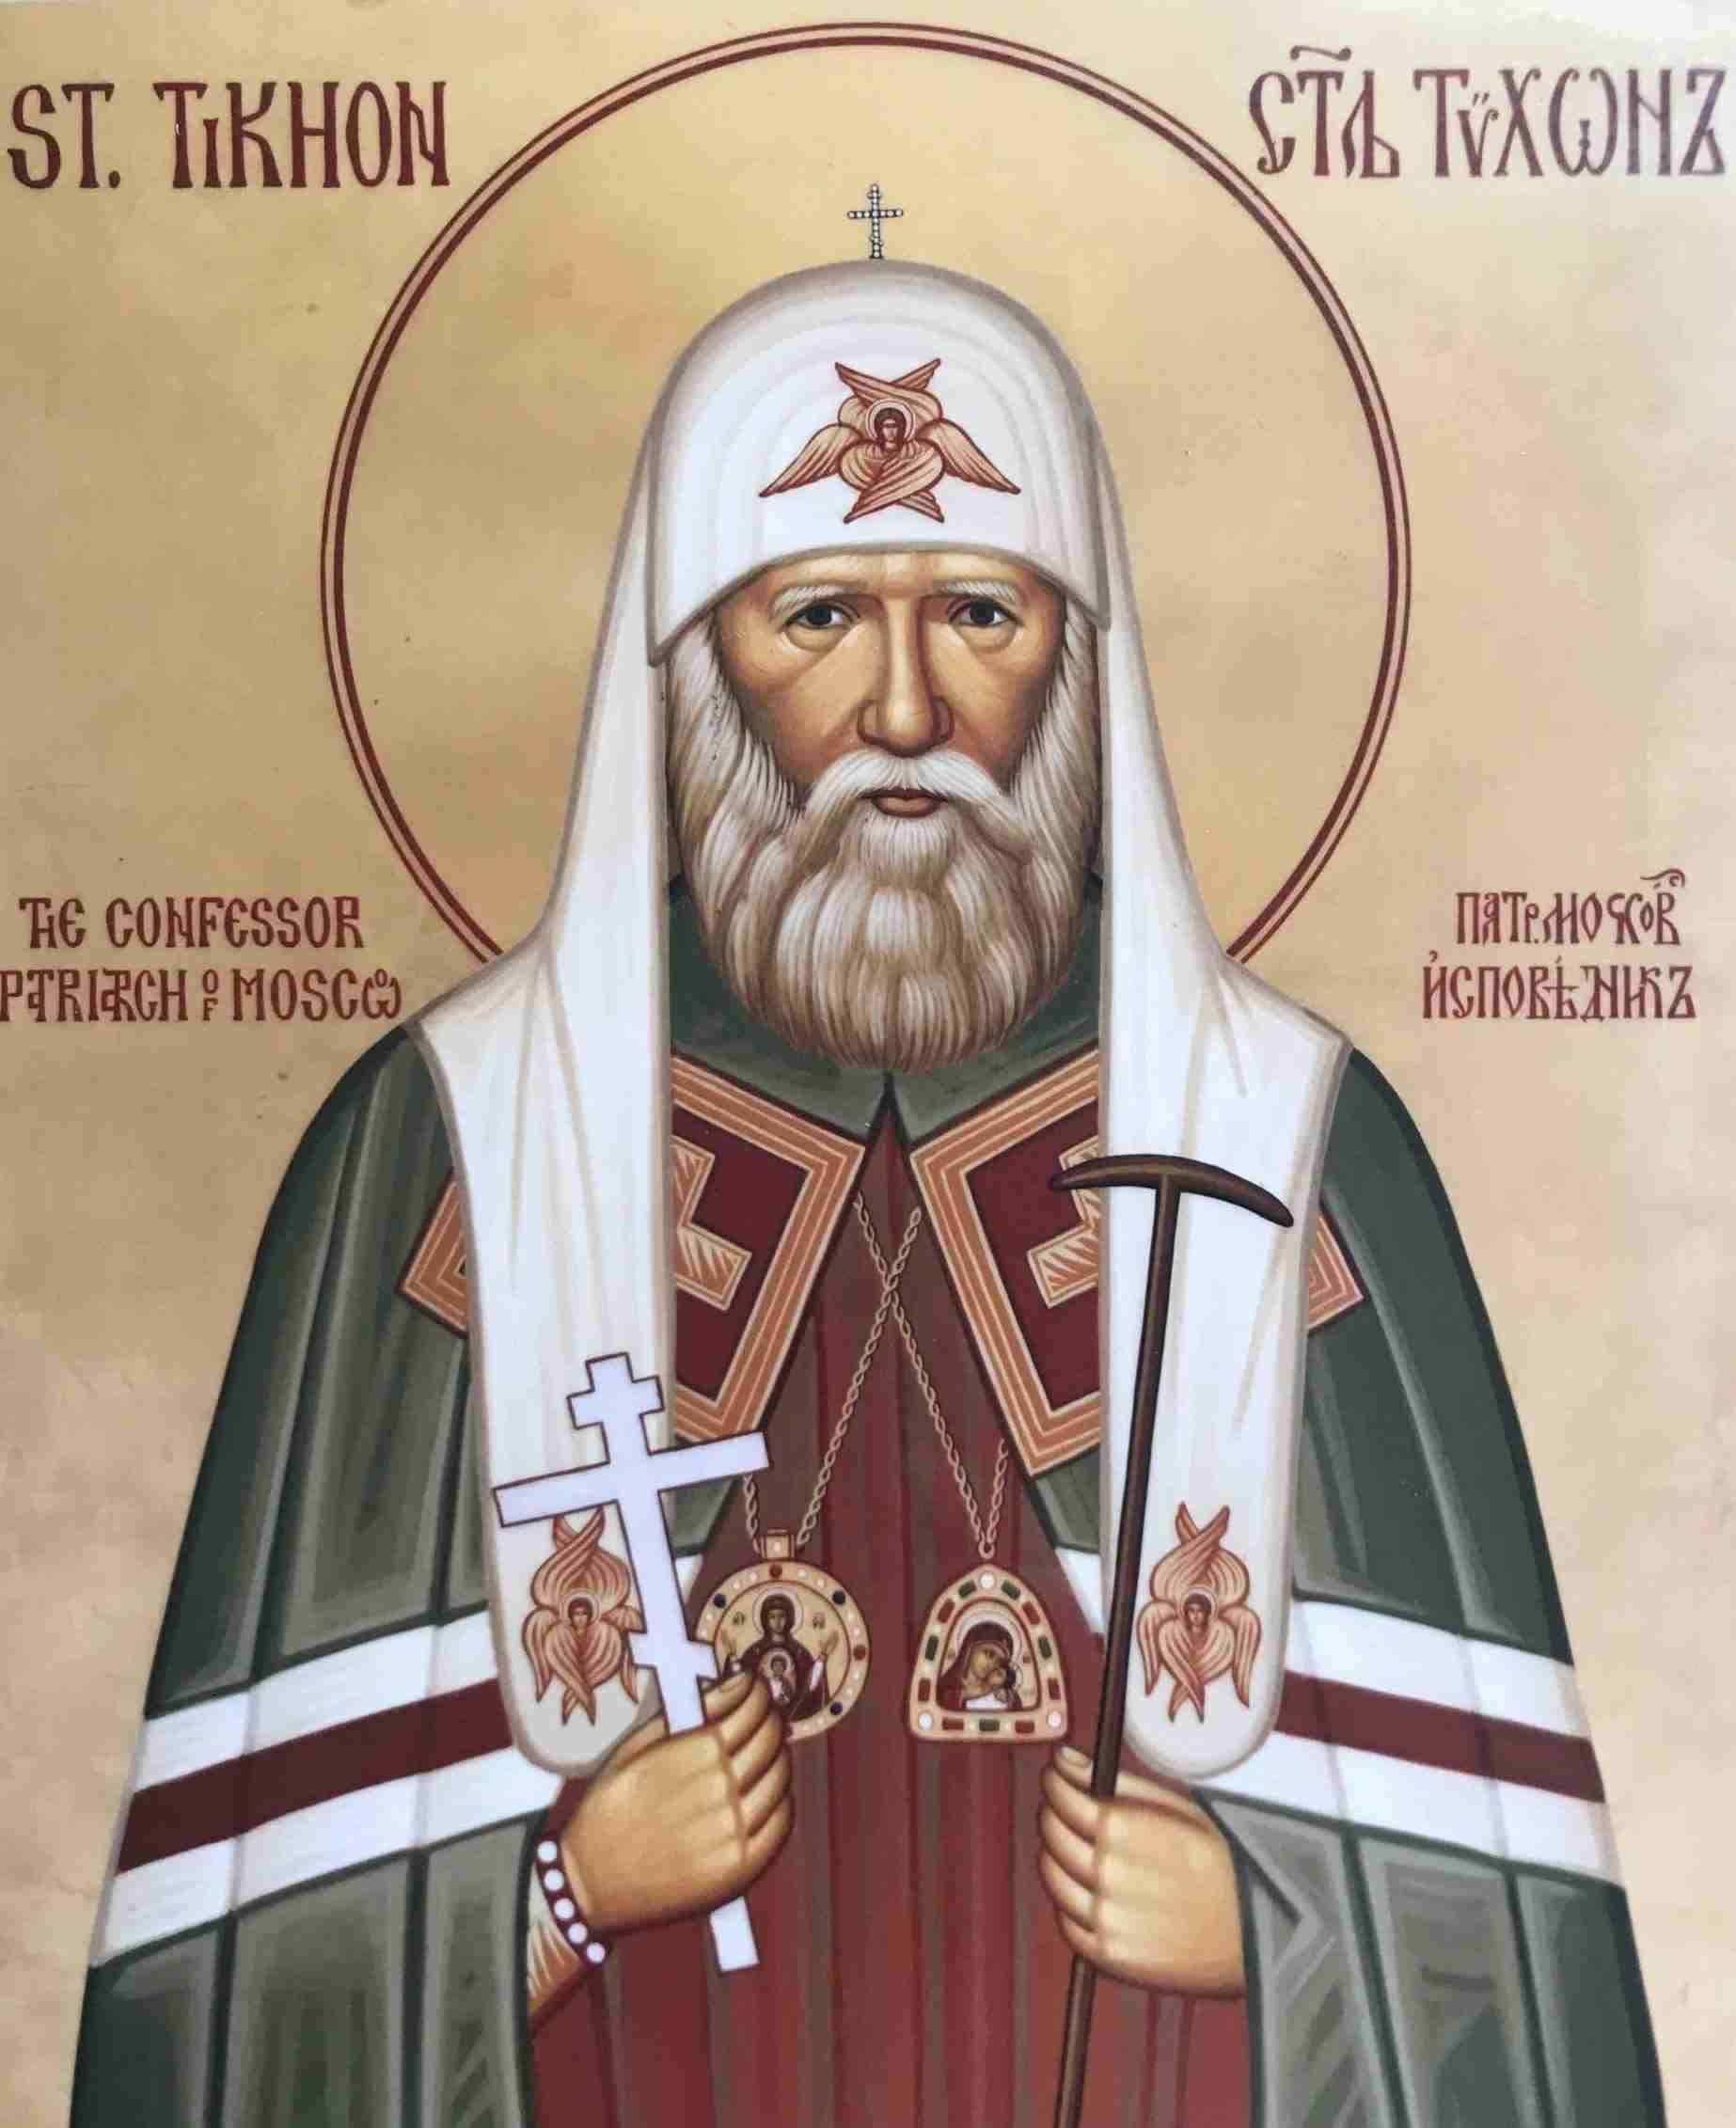 St. Tikhon of Moscow Orthodox Church